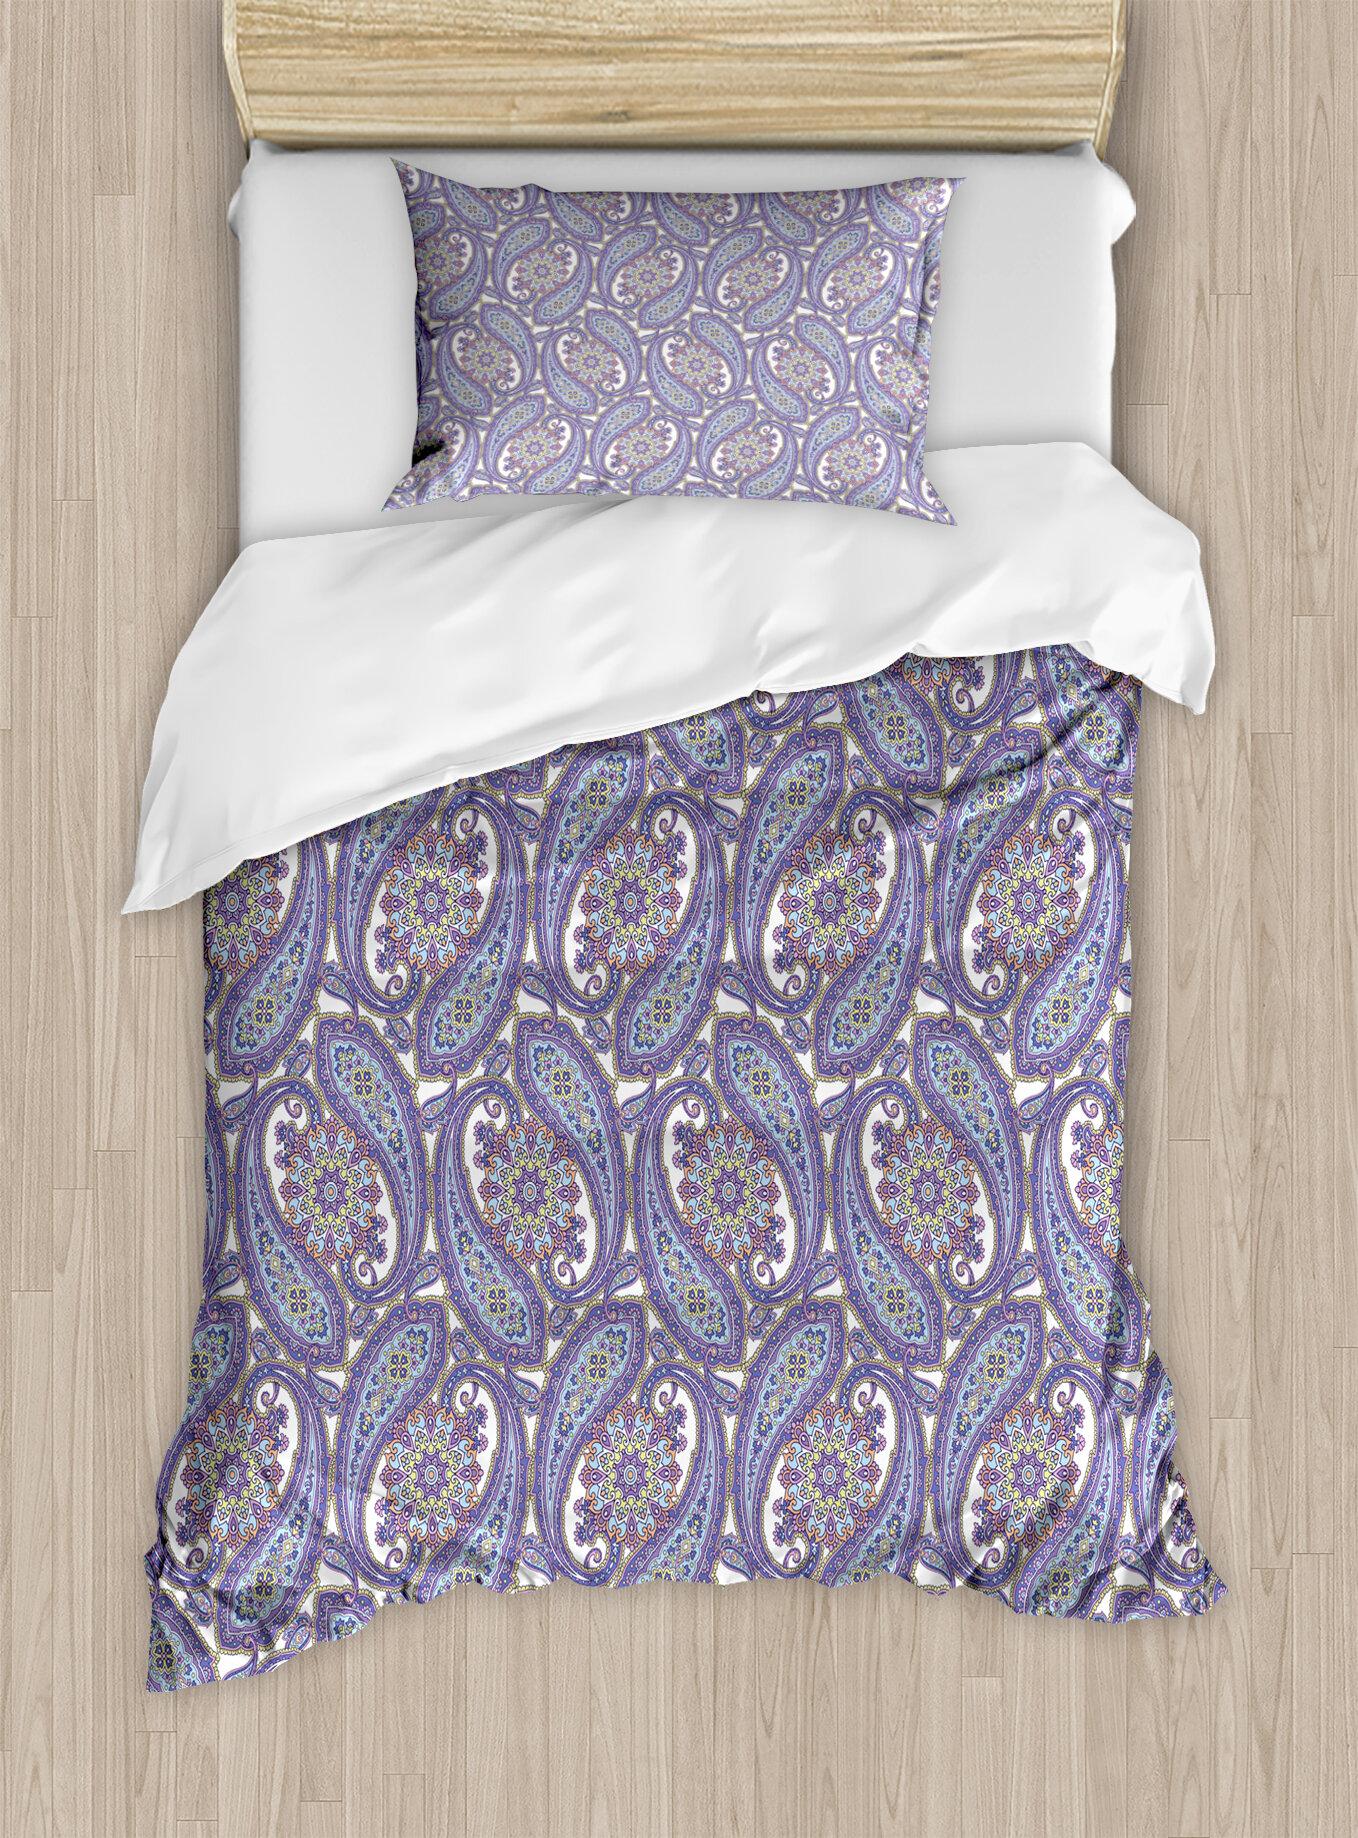 Kess InHouse Dawid ROC Cool Roses-Floral Stripes Featherweight Sham 30 X 20